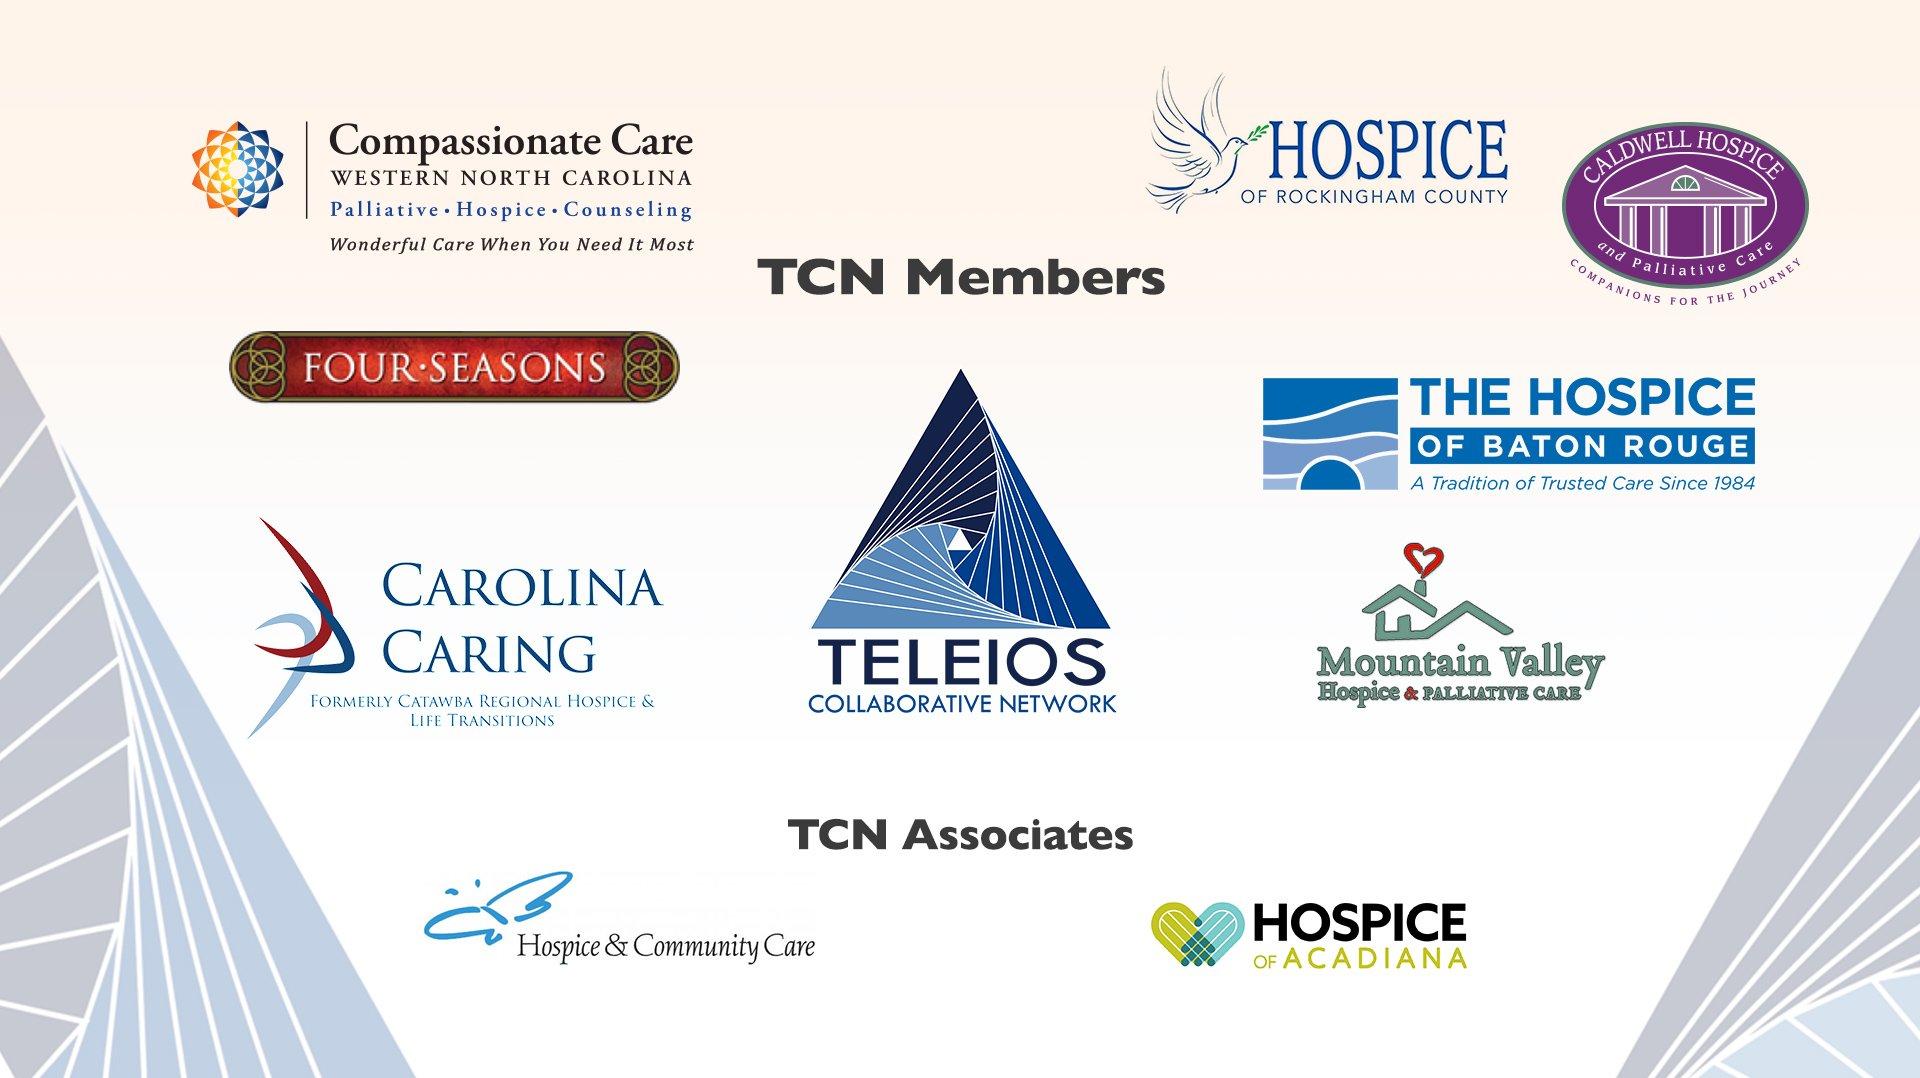 TCN_members_assoc-1